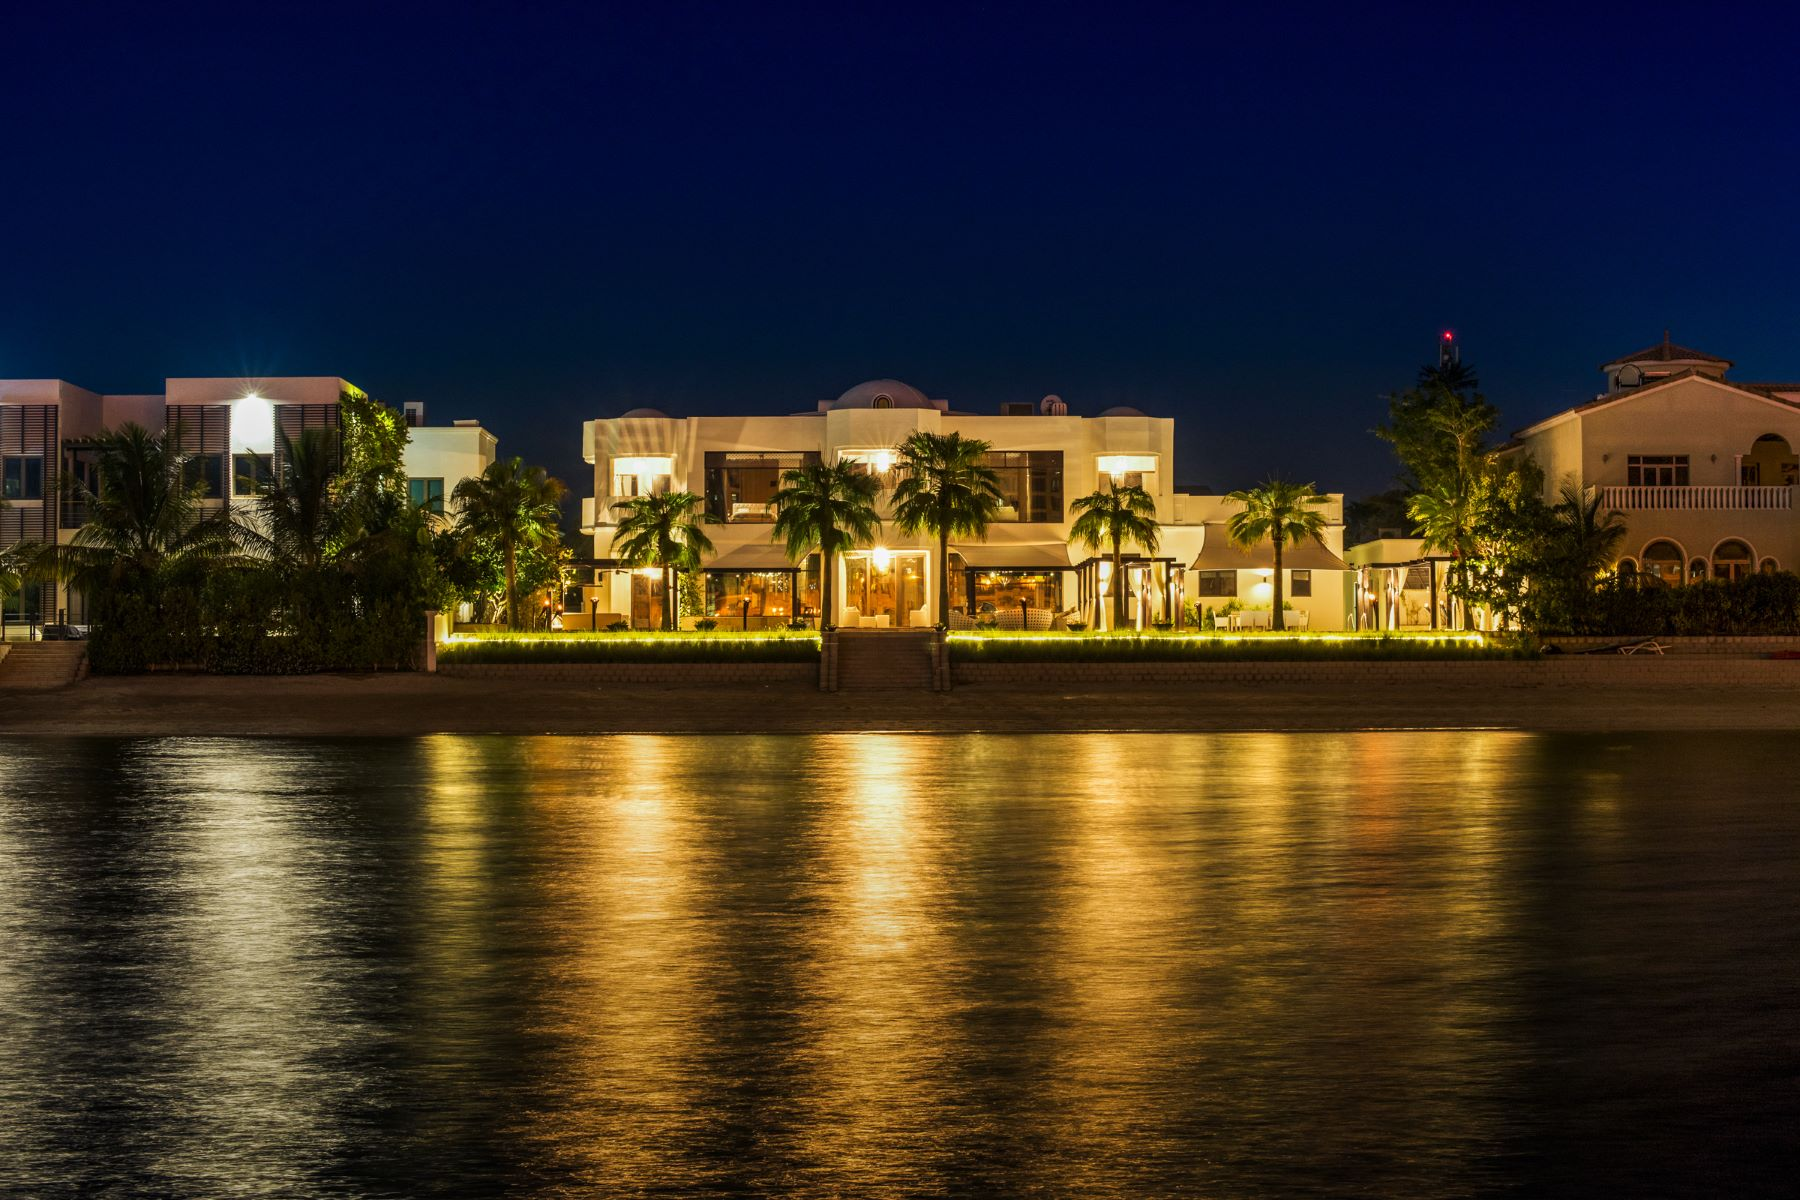 Property for Sale at Italian Luxury Beachfront Living Dubai, Dubai United Arab Emirates